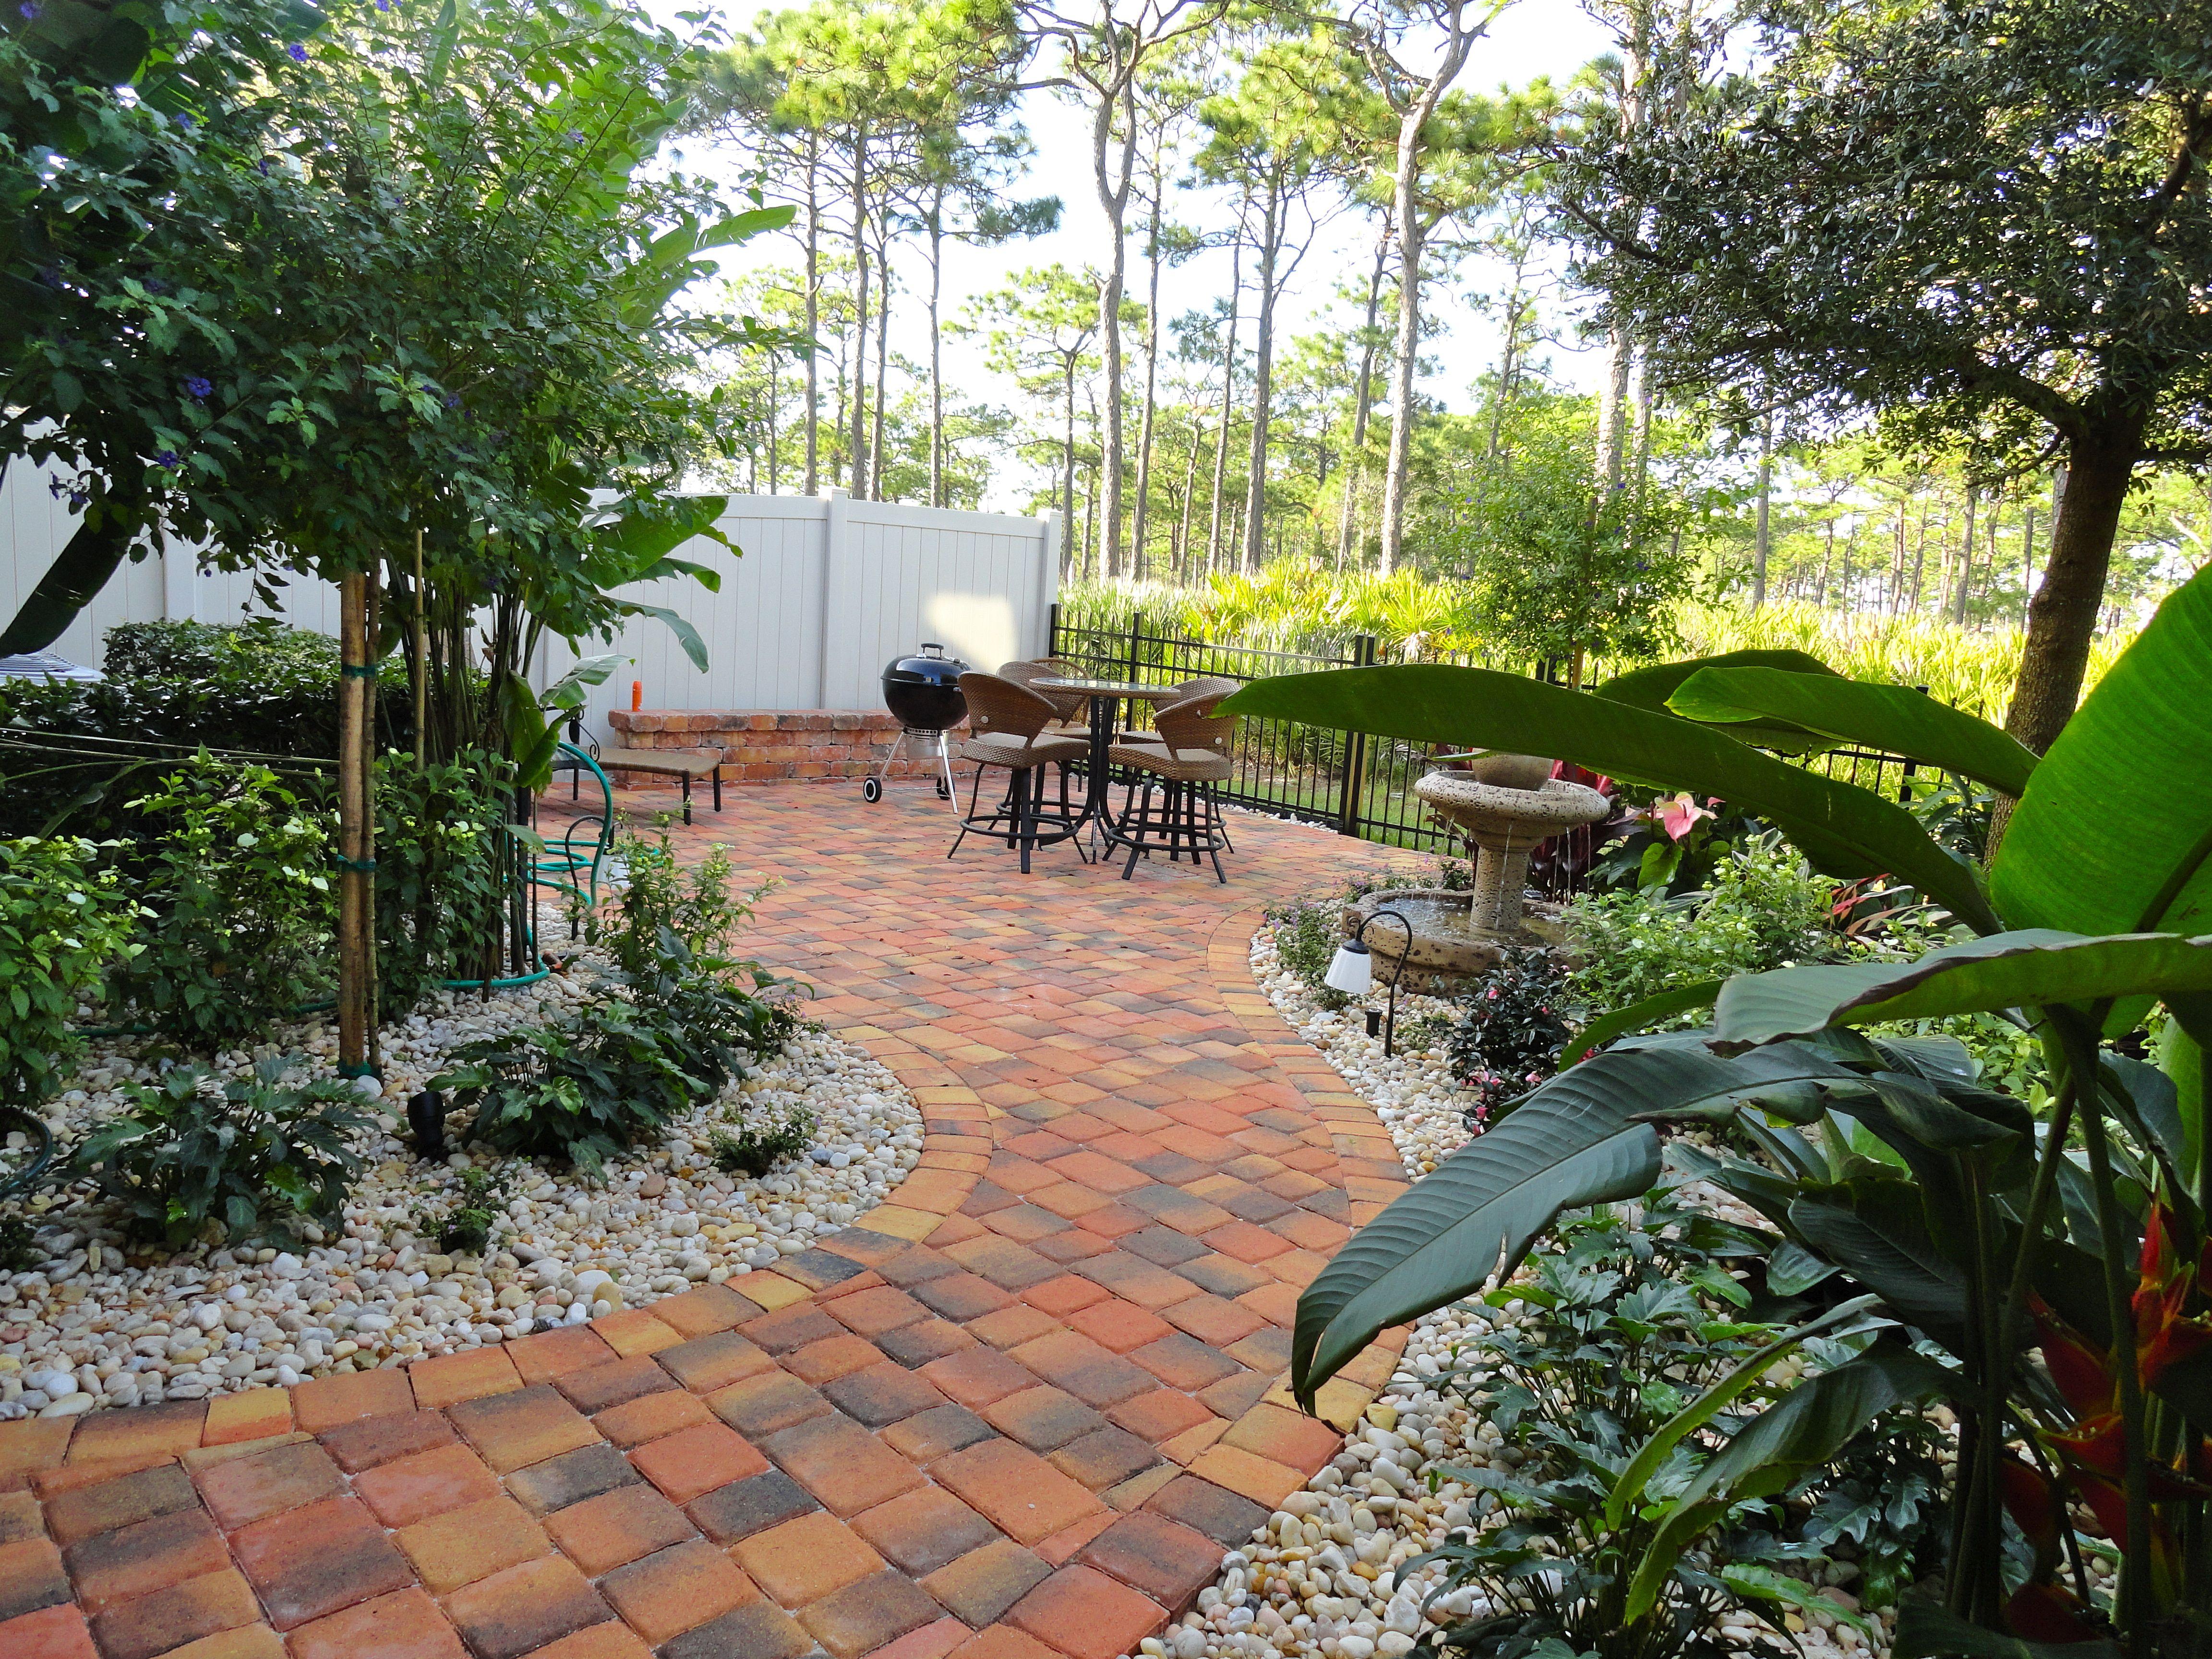 florida landscape design ideas courtyard features construction